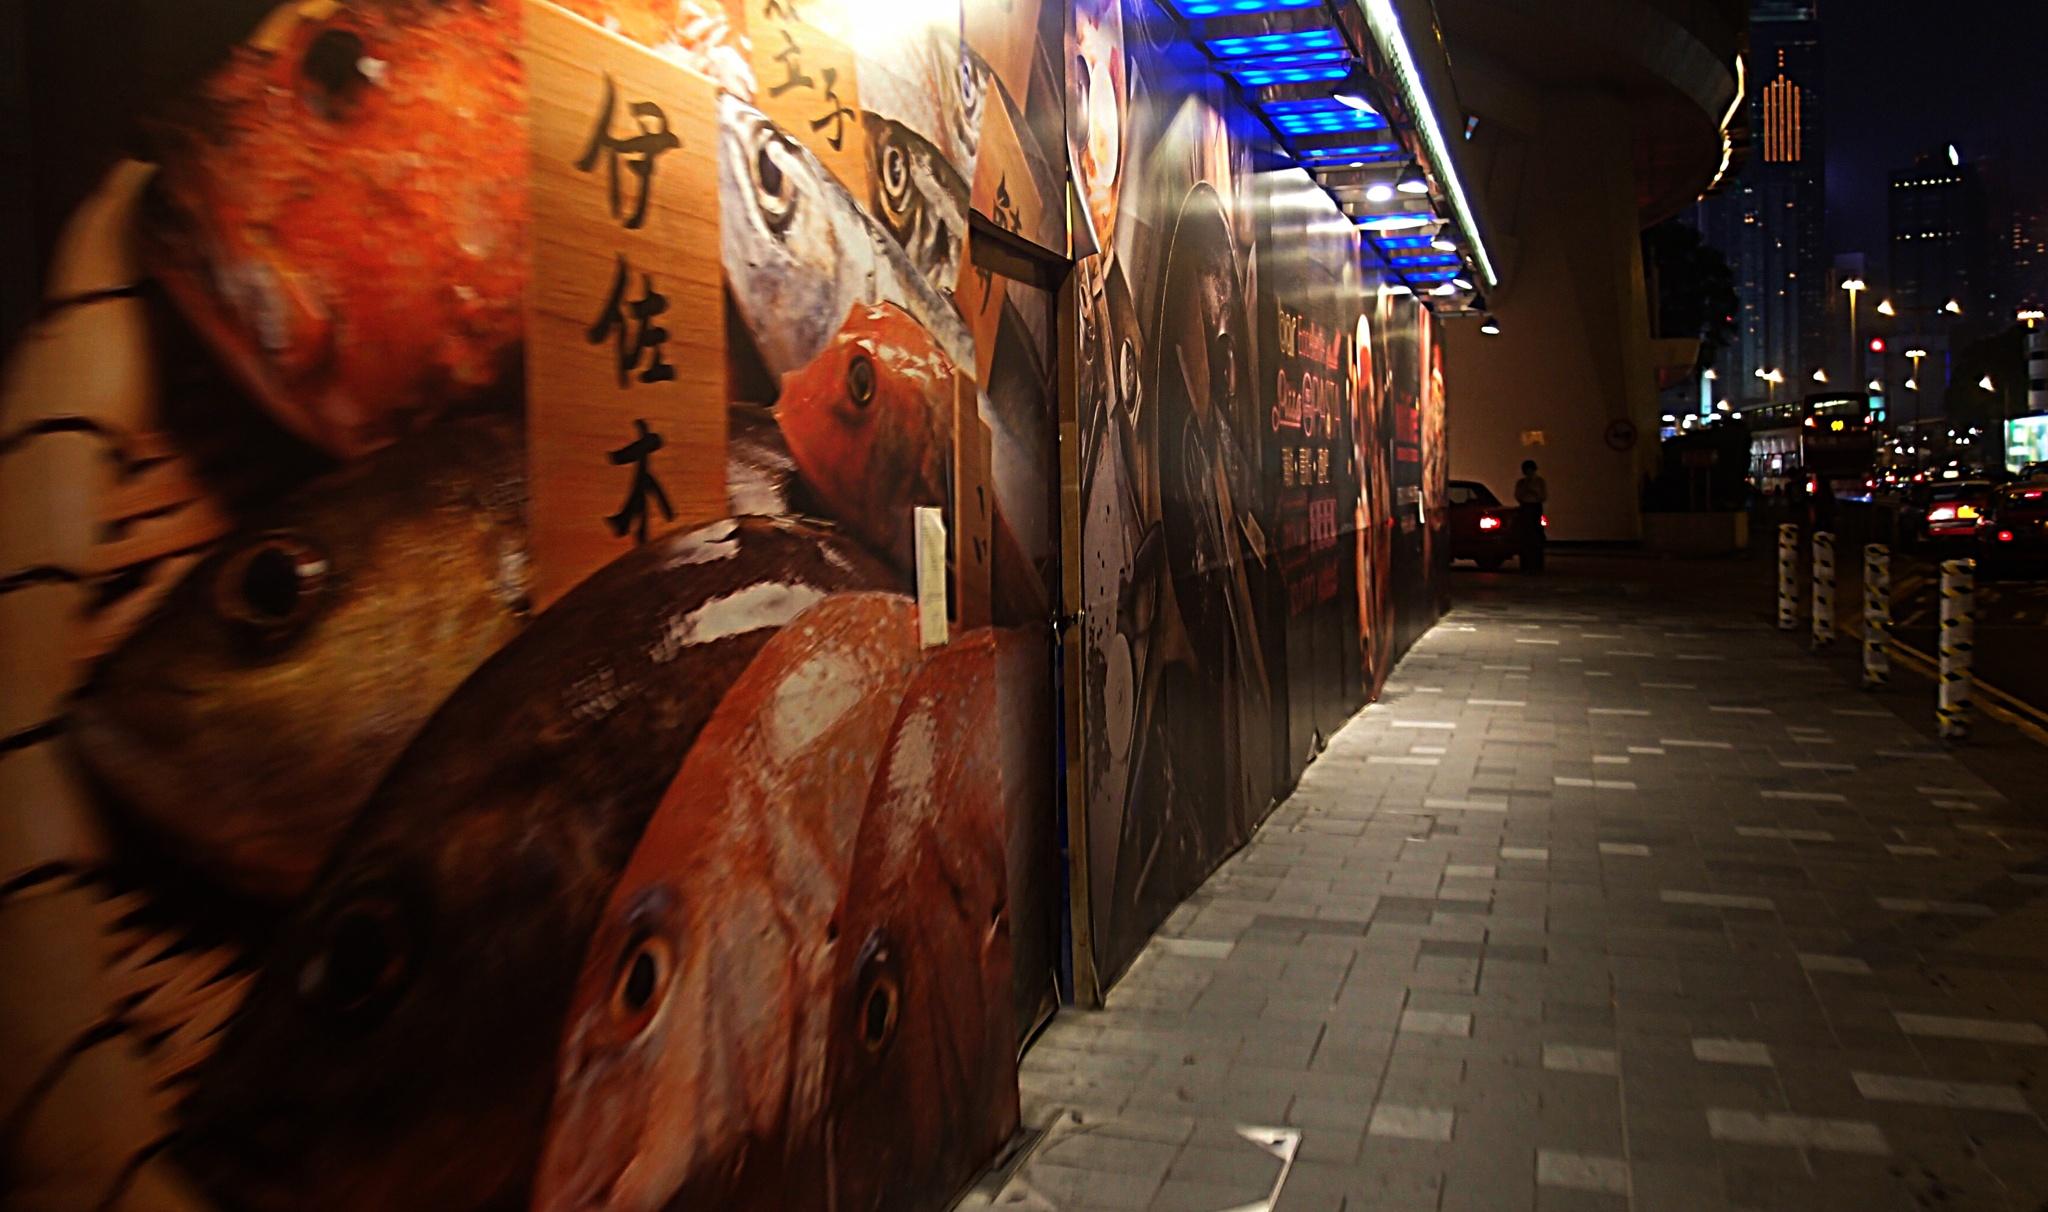 ...in Causeway Bay... by cyccanhk